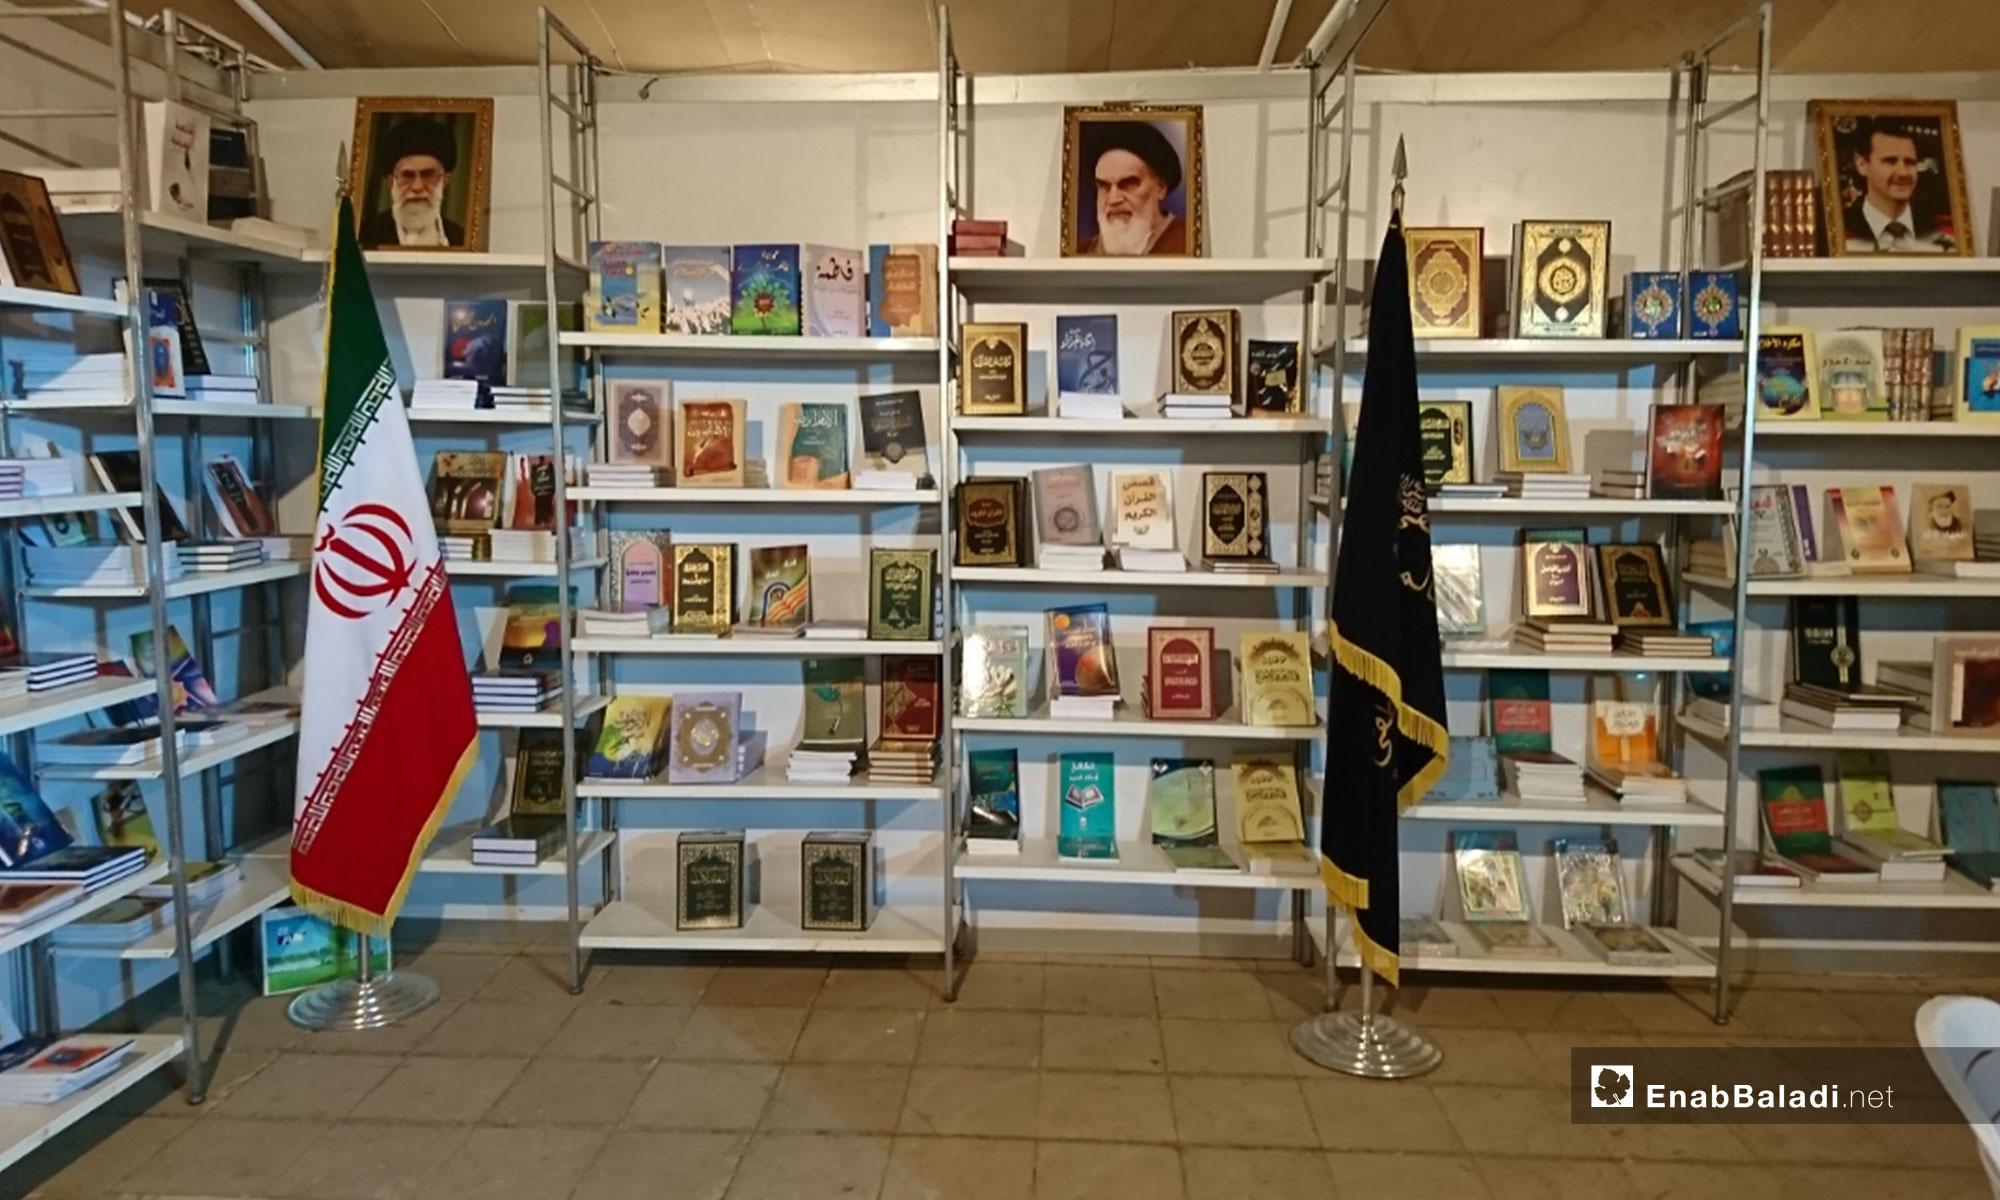 Iranian publishing house, the Book Fair in Damascus - August 8, 2018 (Enab Baladi)